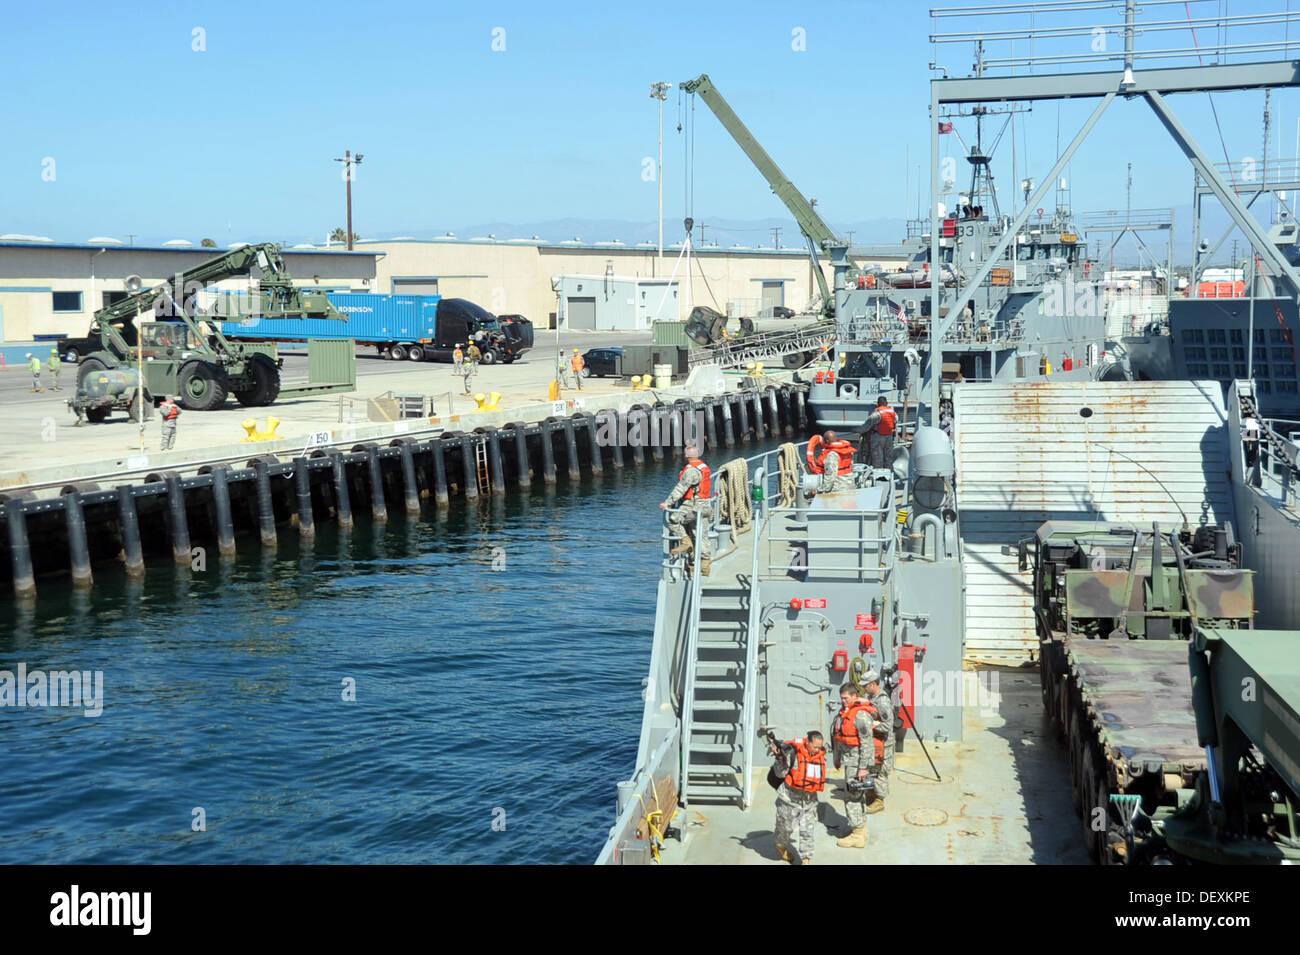 PORT HUENEME, Calif. – Landing Craft Utility (LCU) 2032, United States Army Vessel (USAV) Palo Alto, 481st Transportation Compan - Stock Image